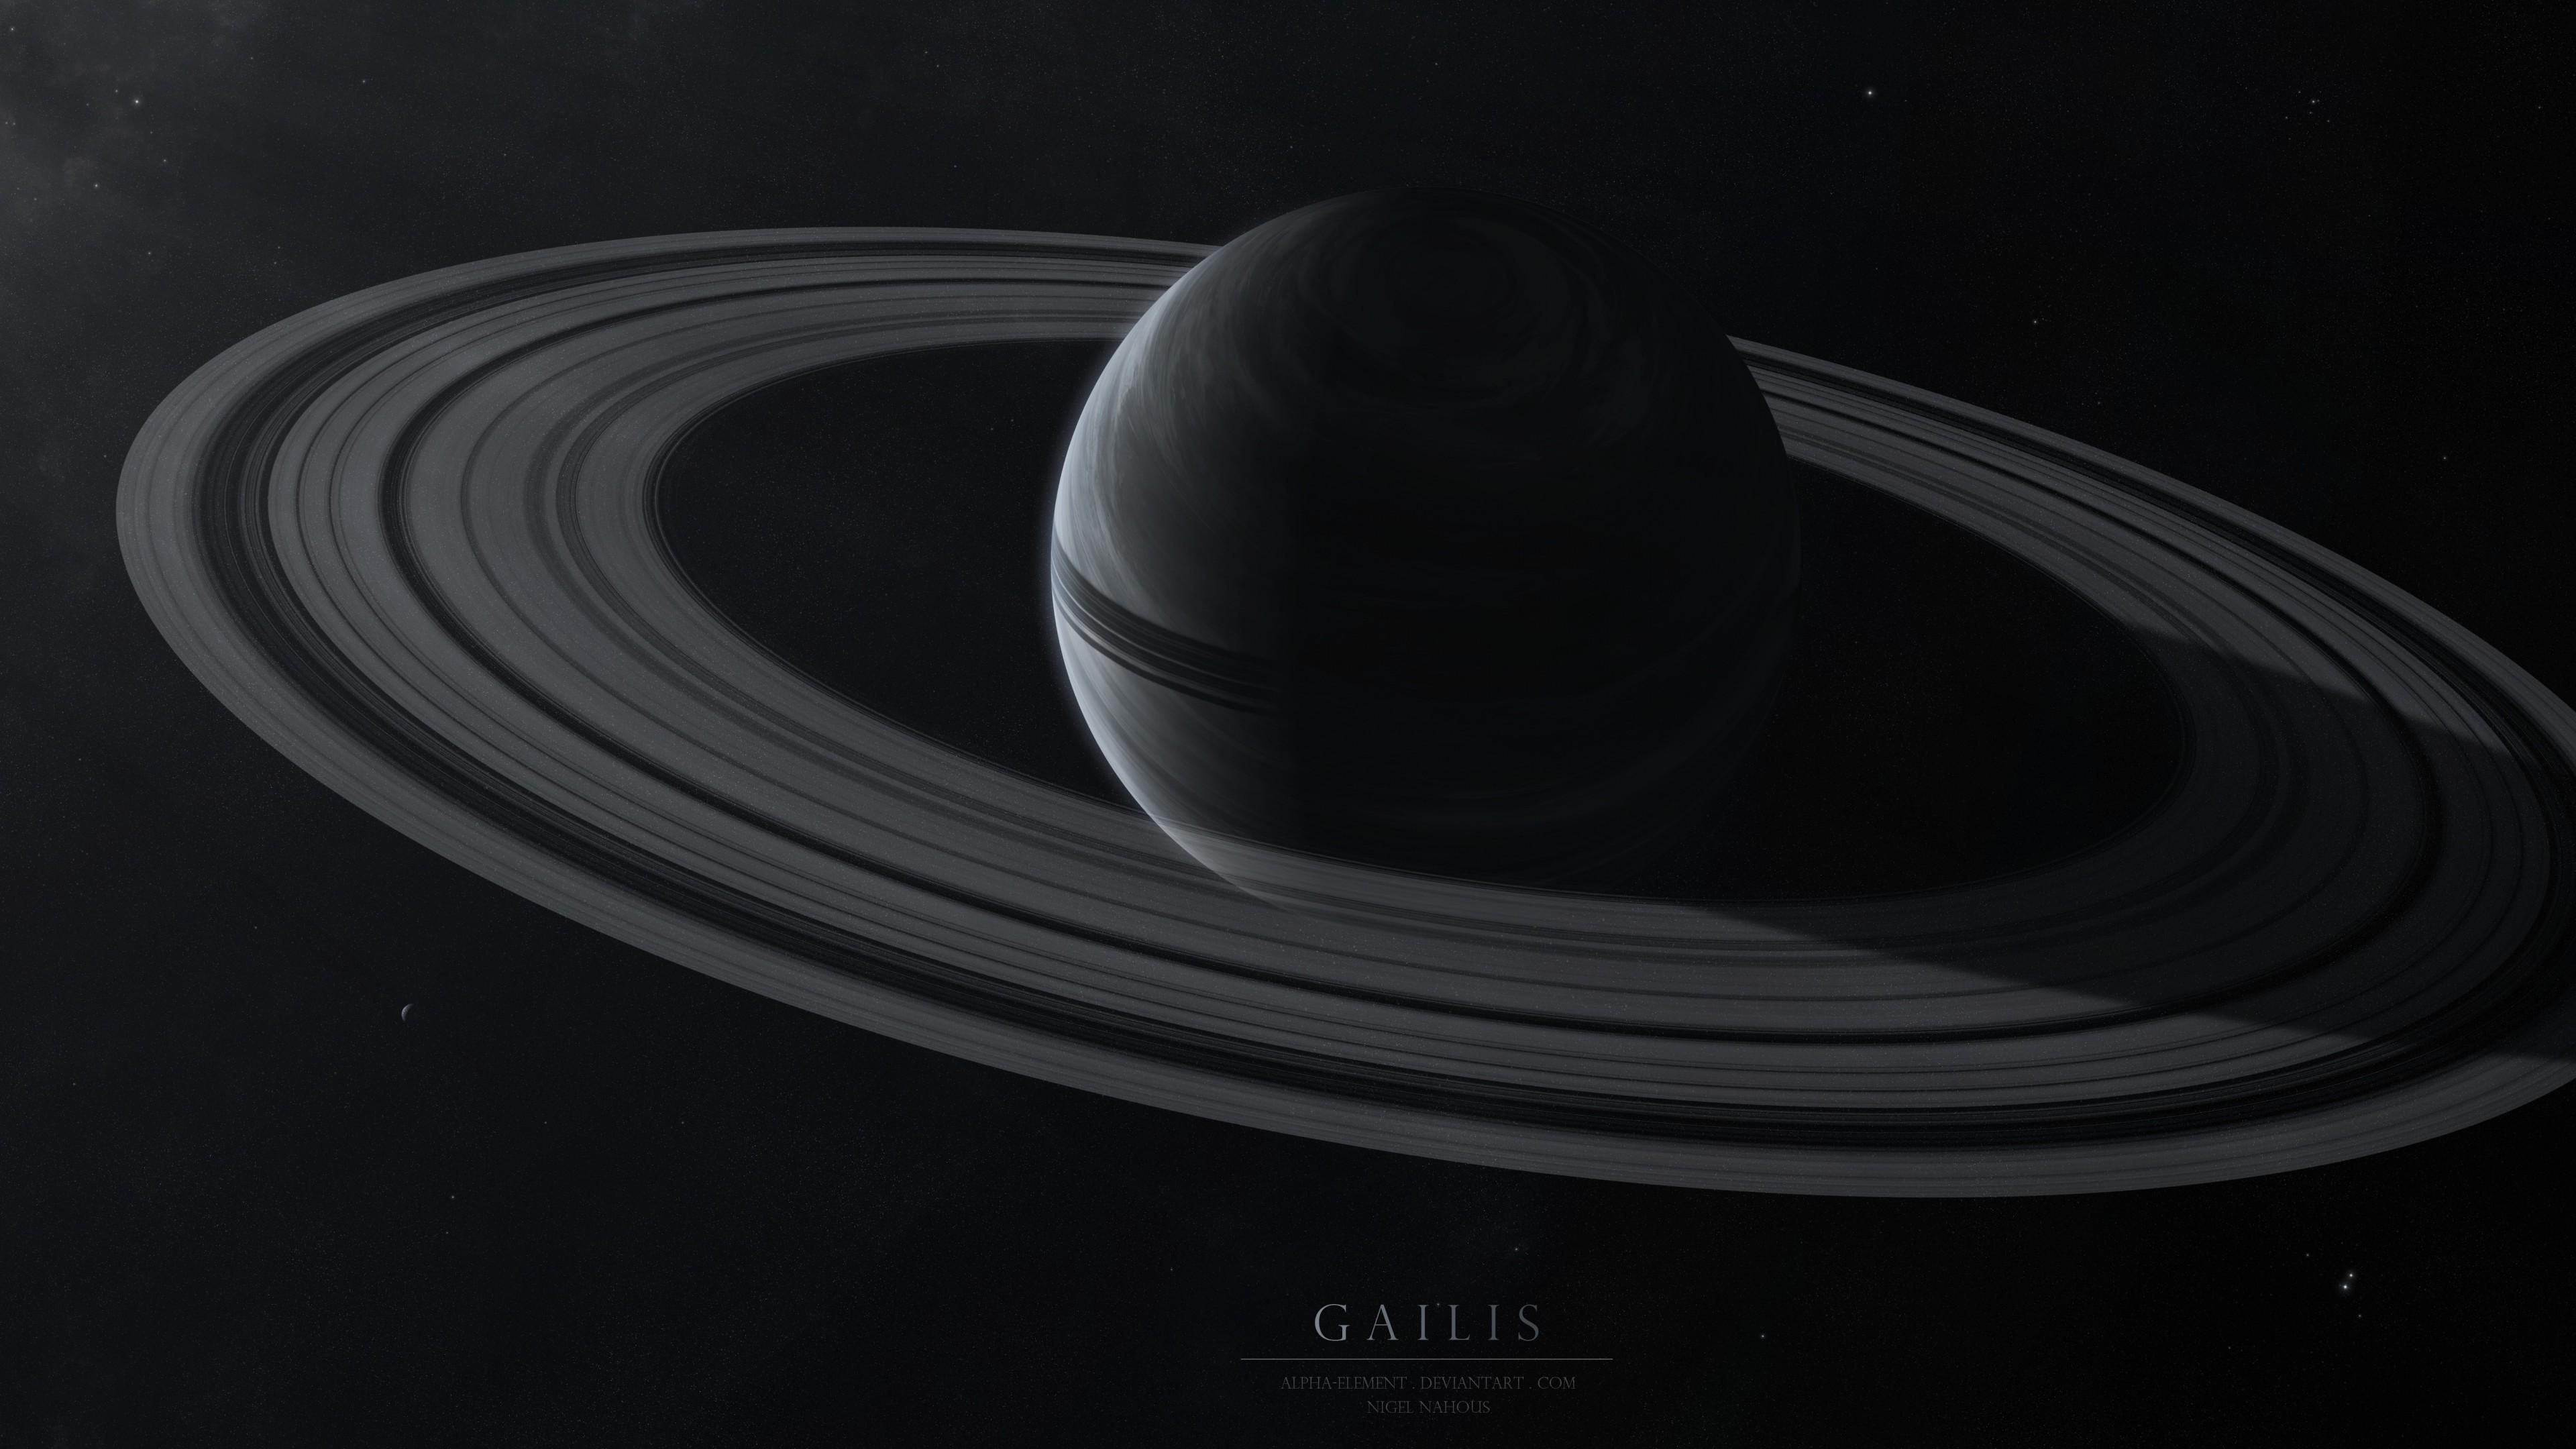 Preview wallpaper gailis, planet, rings, stars, space 3840×2160